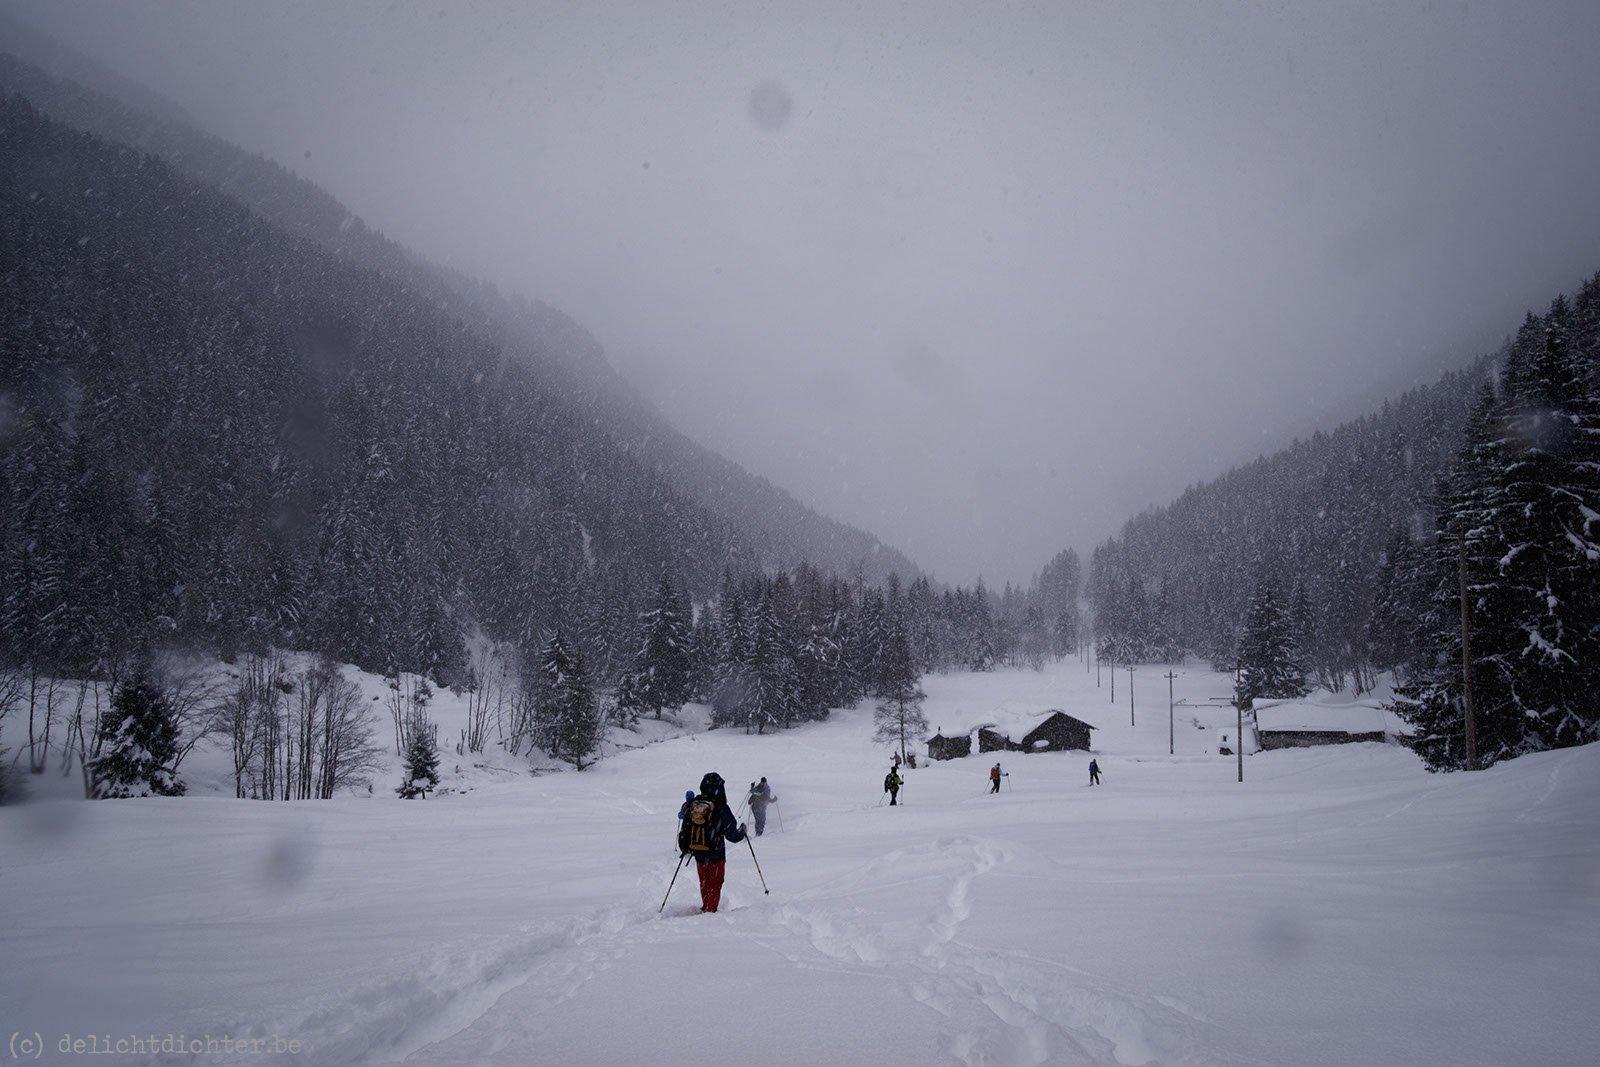 2013_12_sneeuwschoenen_20140102_140623_dxo_v9